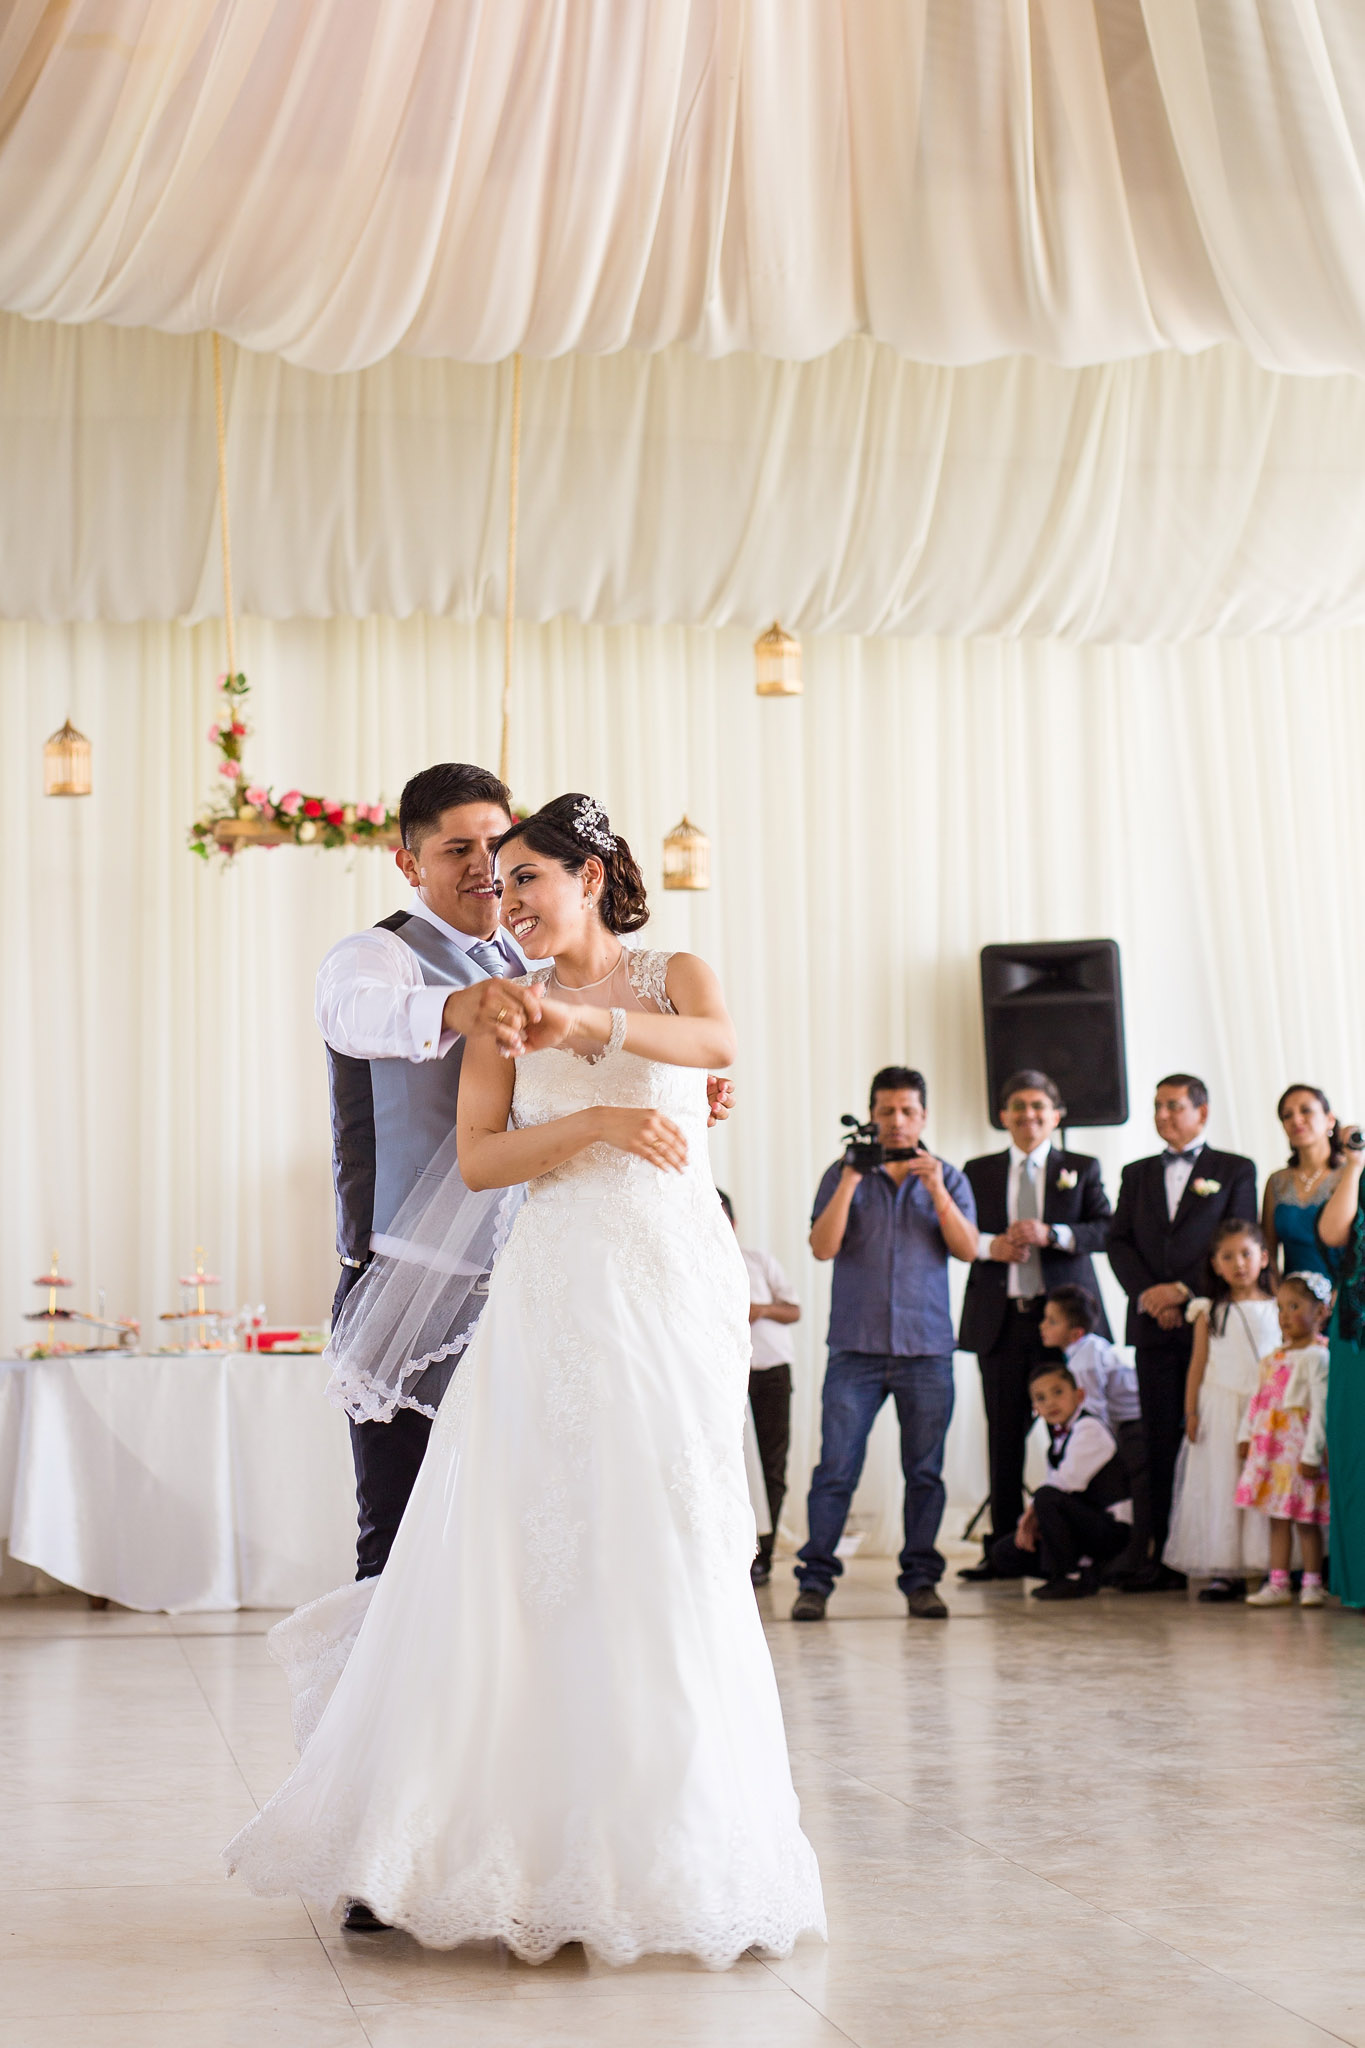 wedding-bolivia-la-paz-first-dance